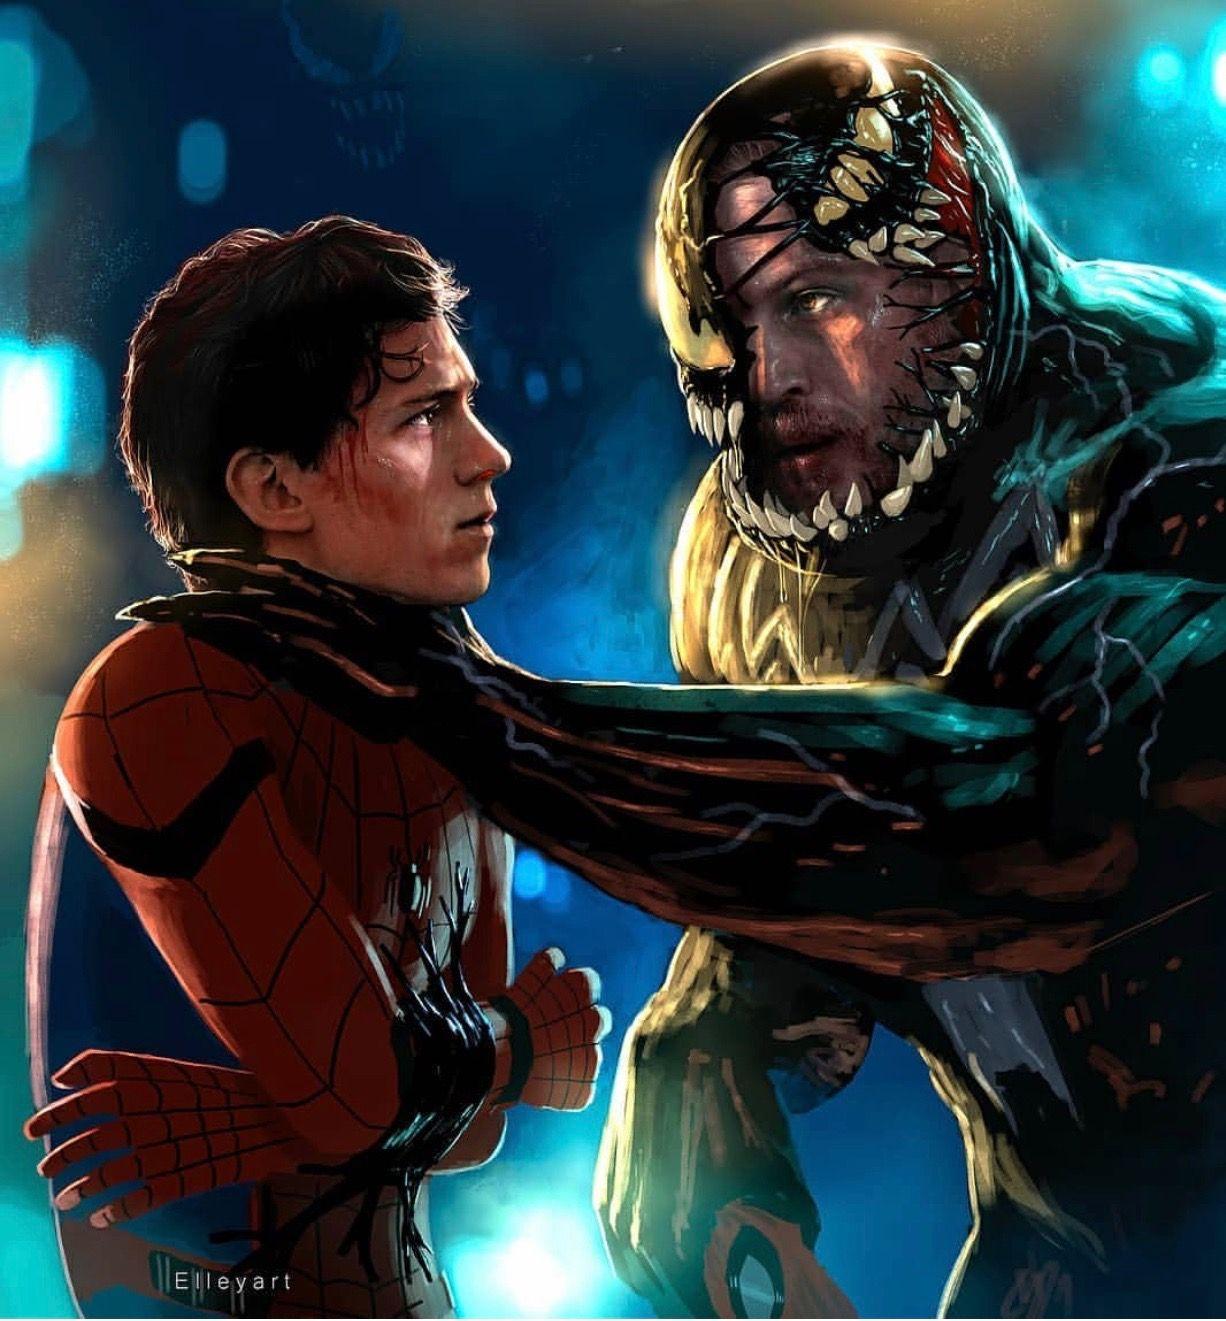 spiderman vs venom (5) | marvel comics | spiderman, marvel, venom